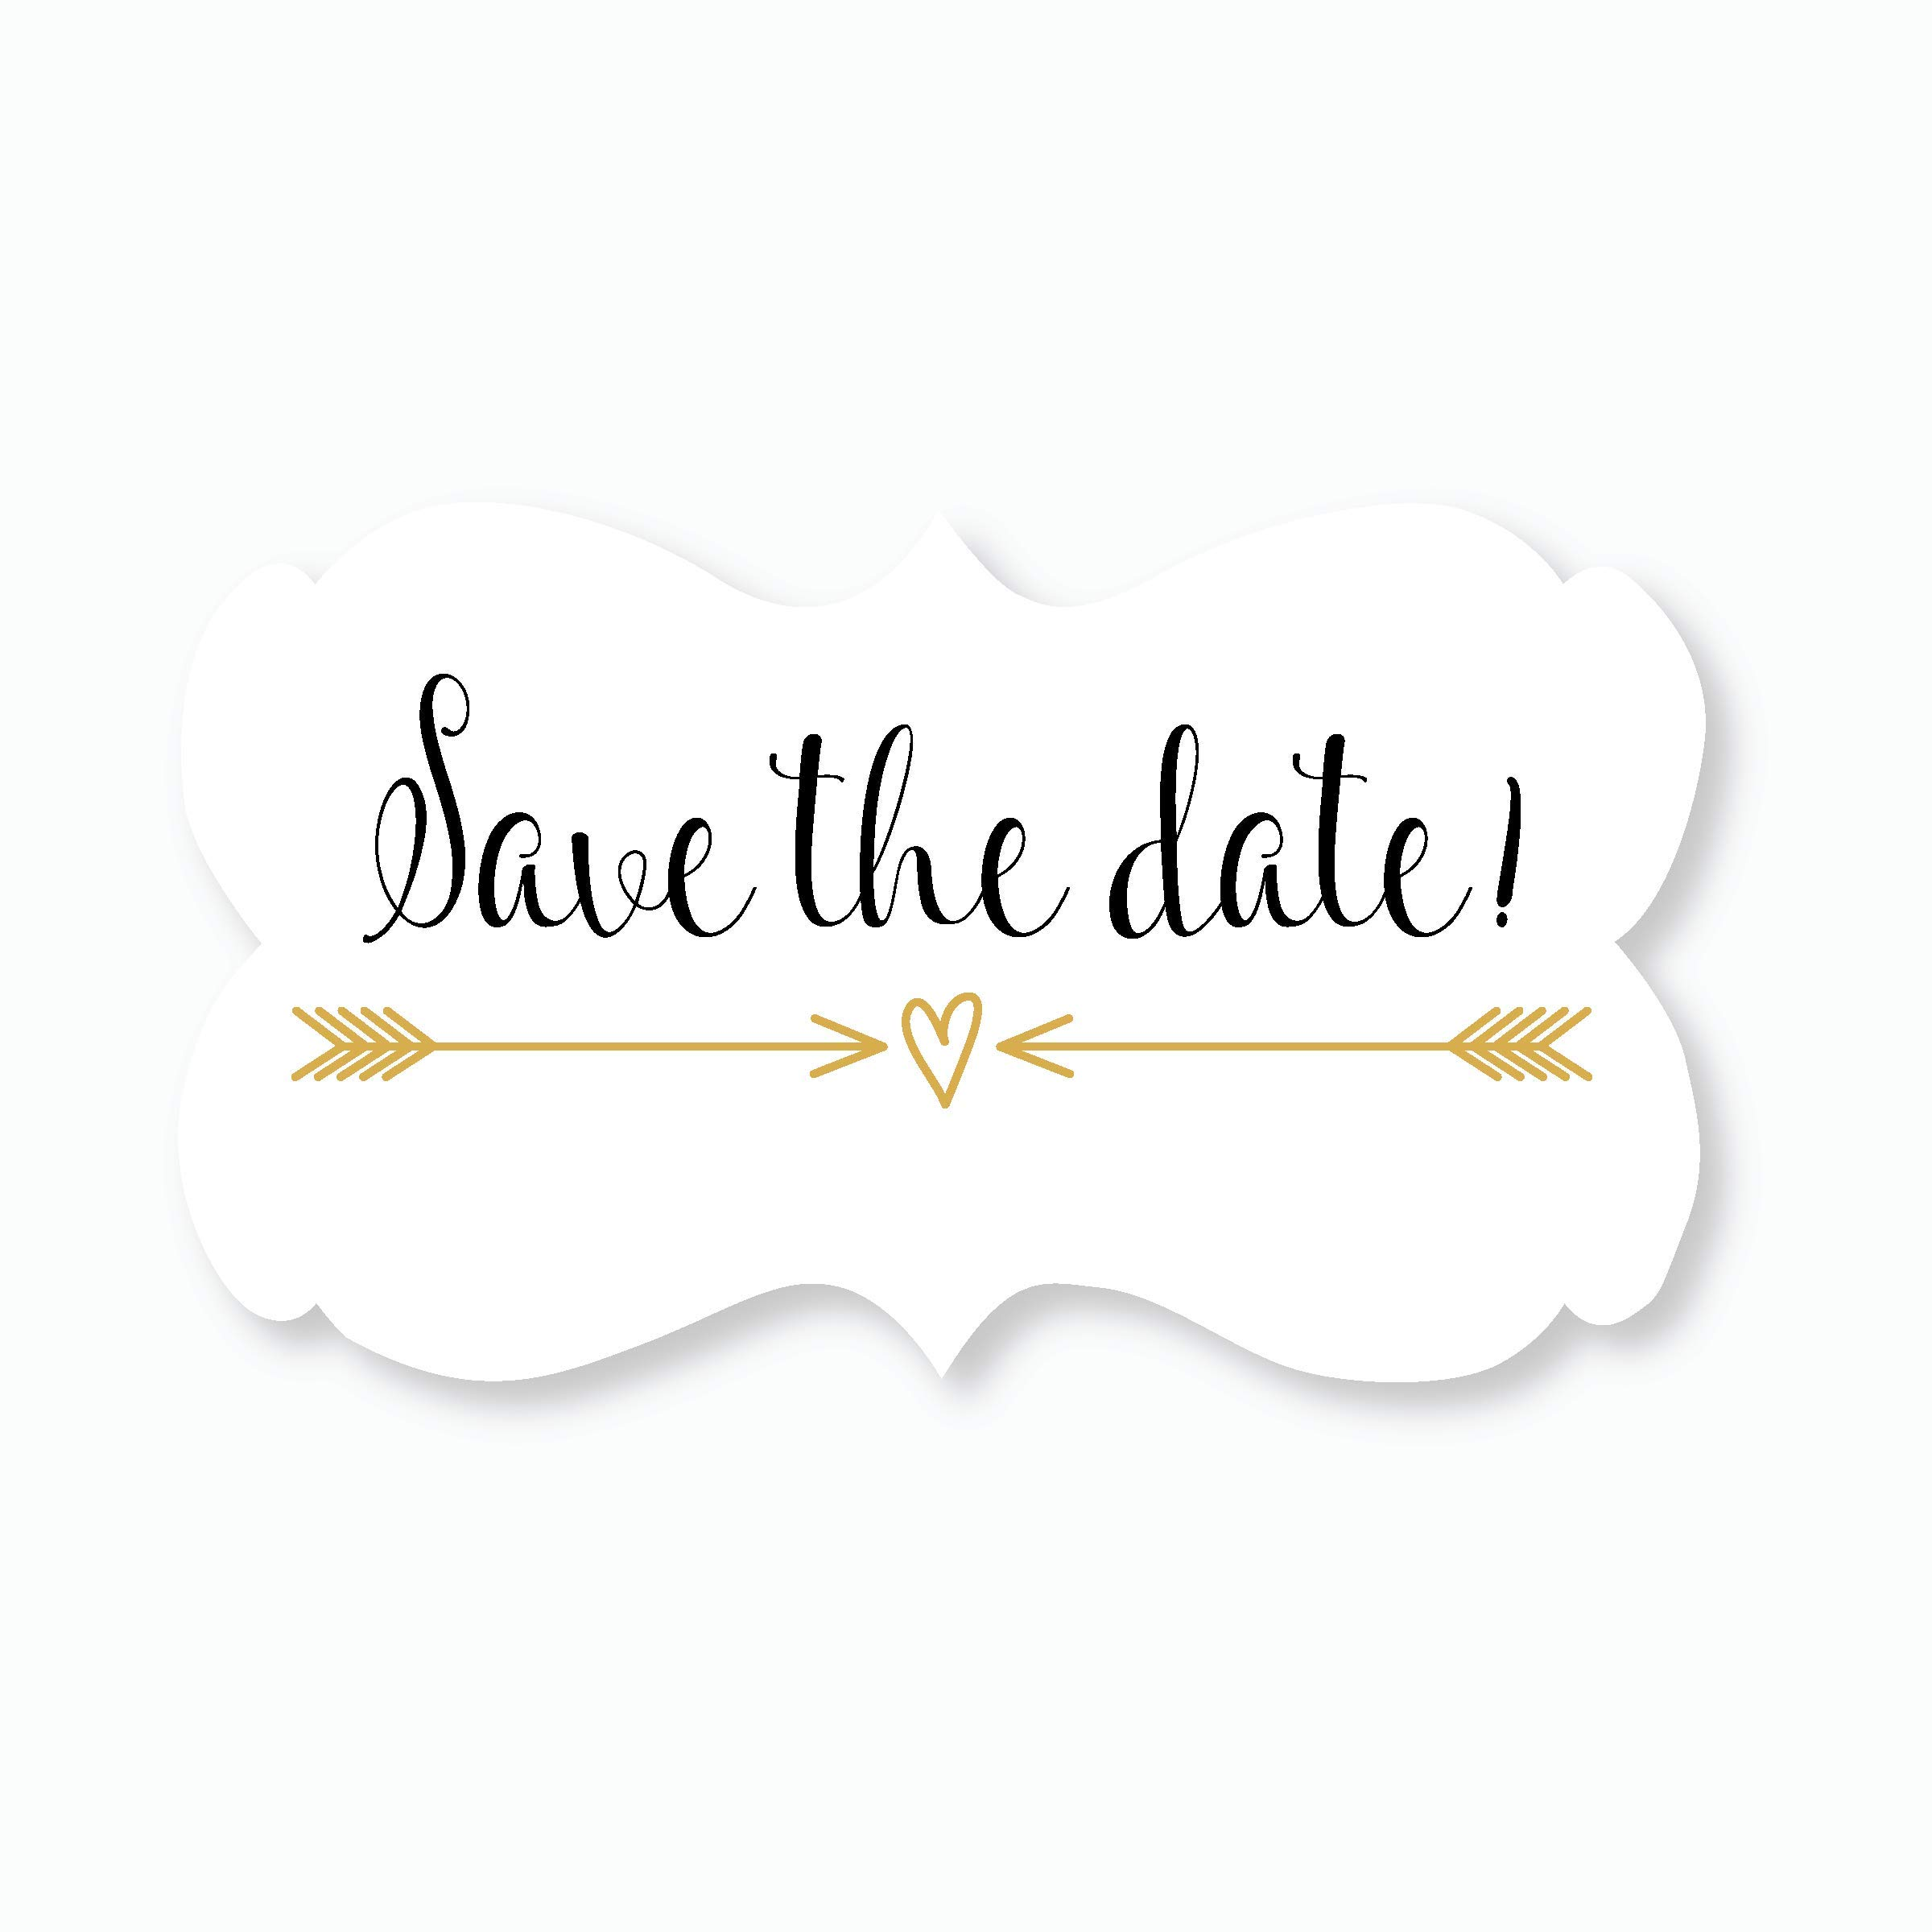 36ct - Save The Date Wedding Envelope Seals (#366) (Gold/Black)